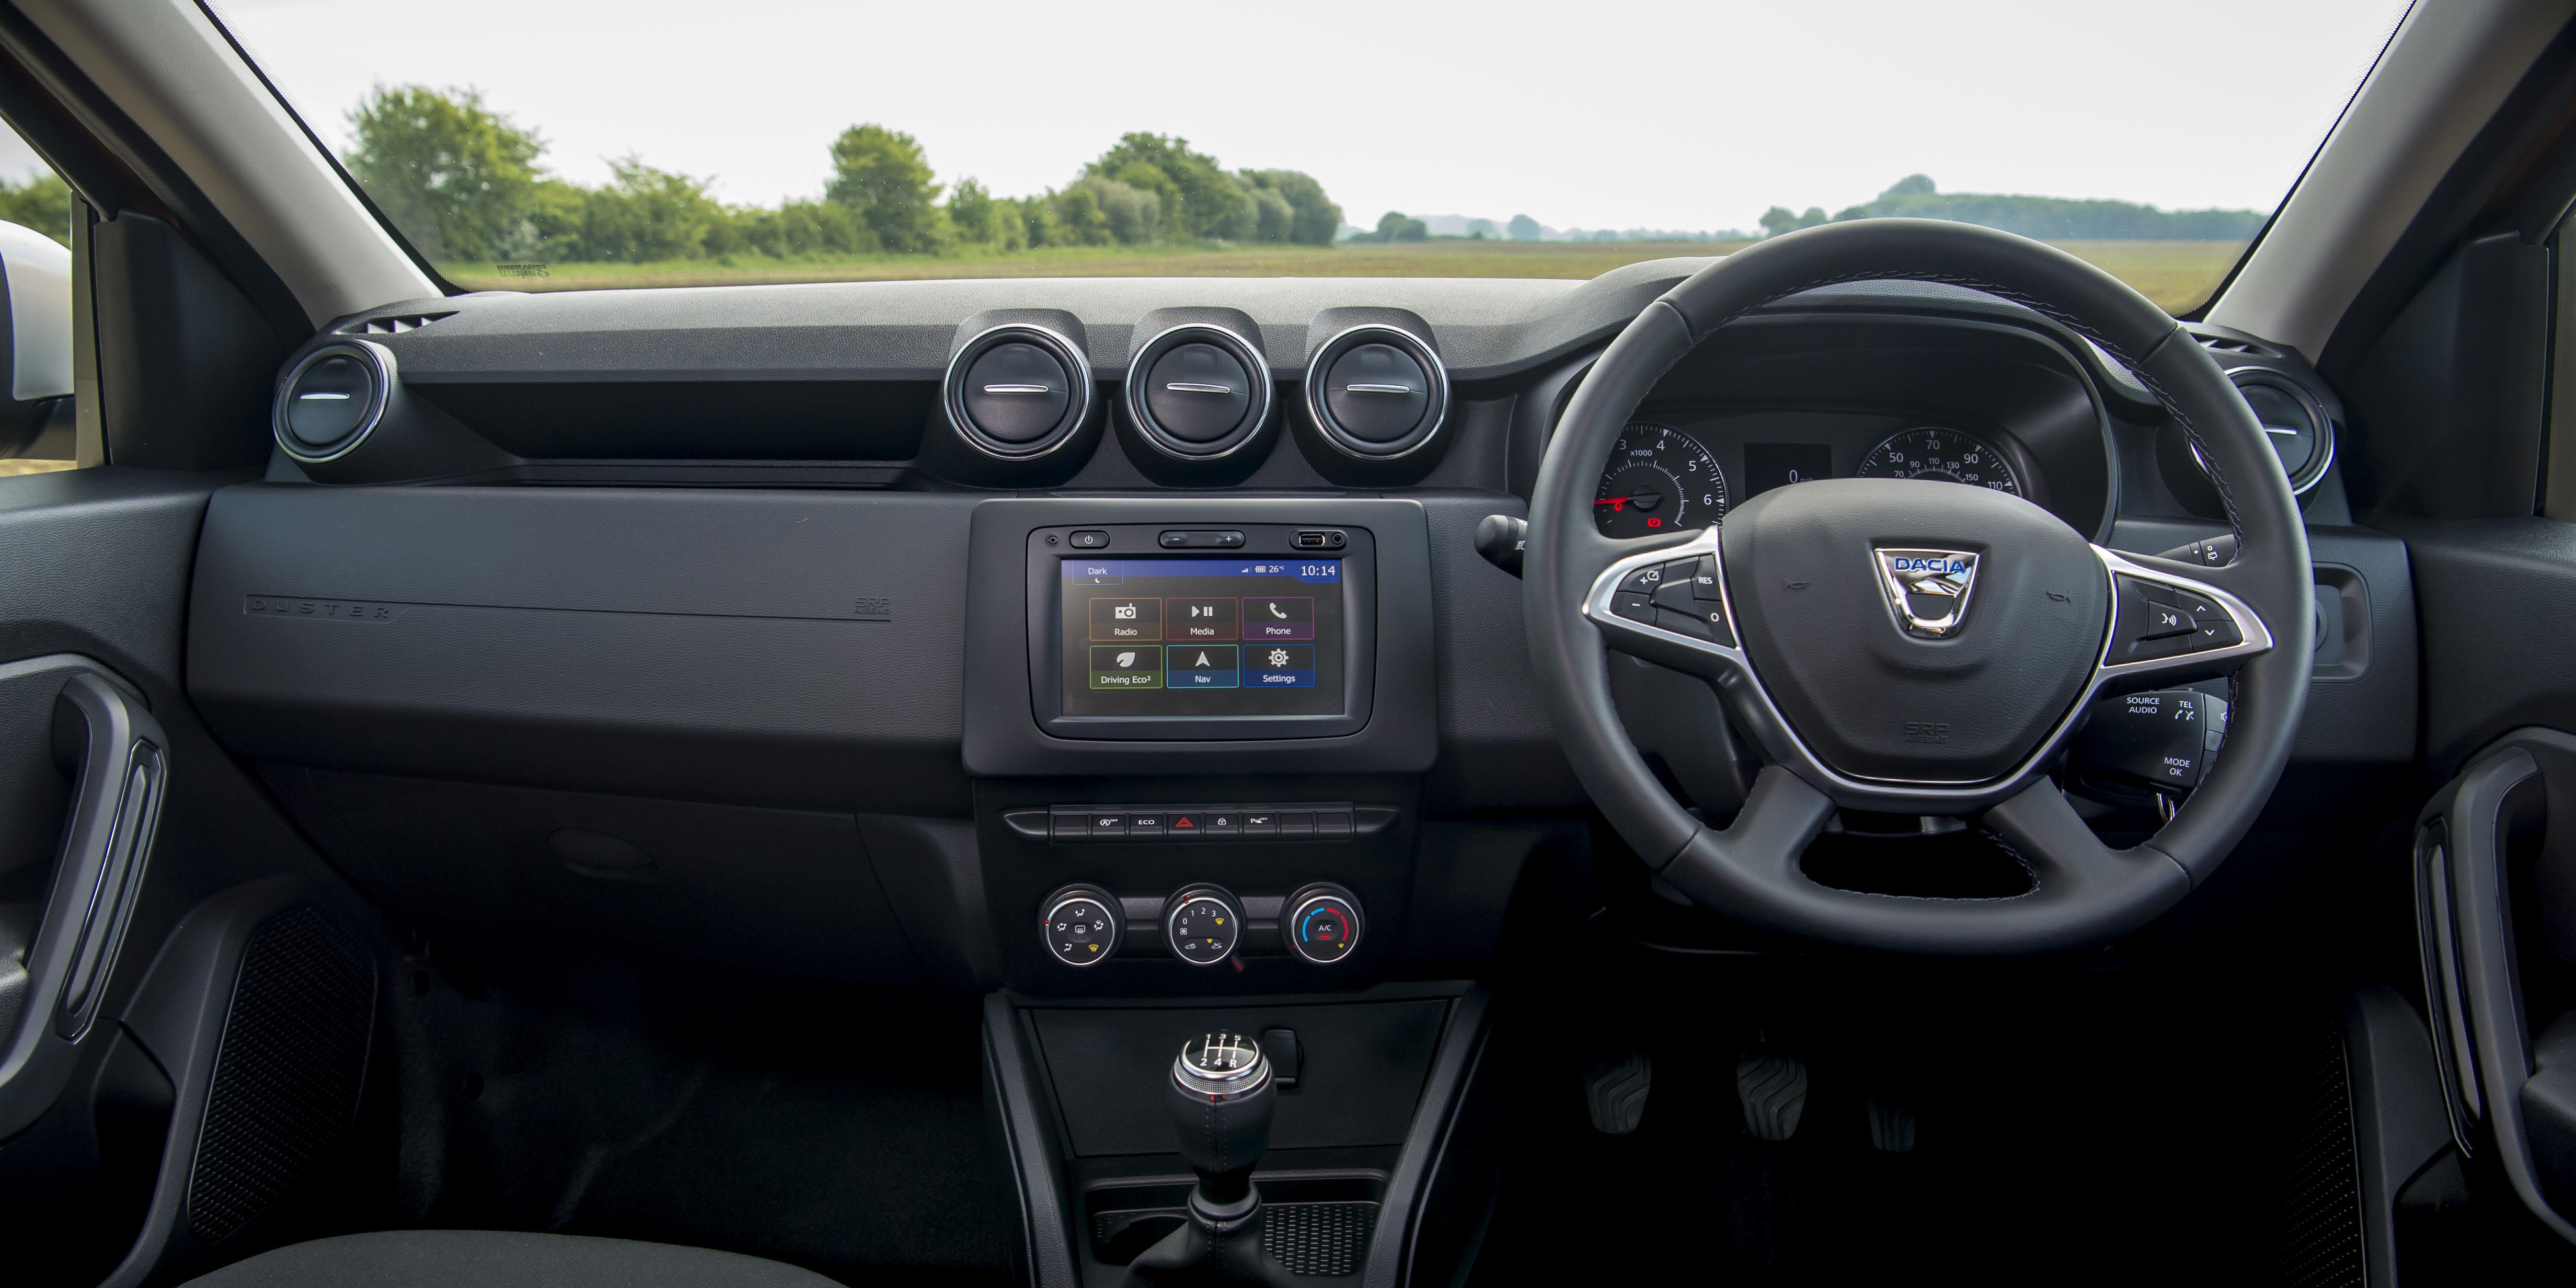 Dacia Duster Interior & Infotainment   carwow